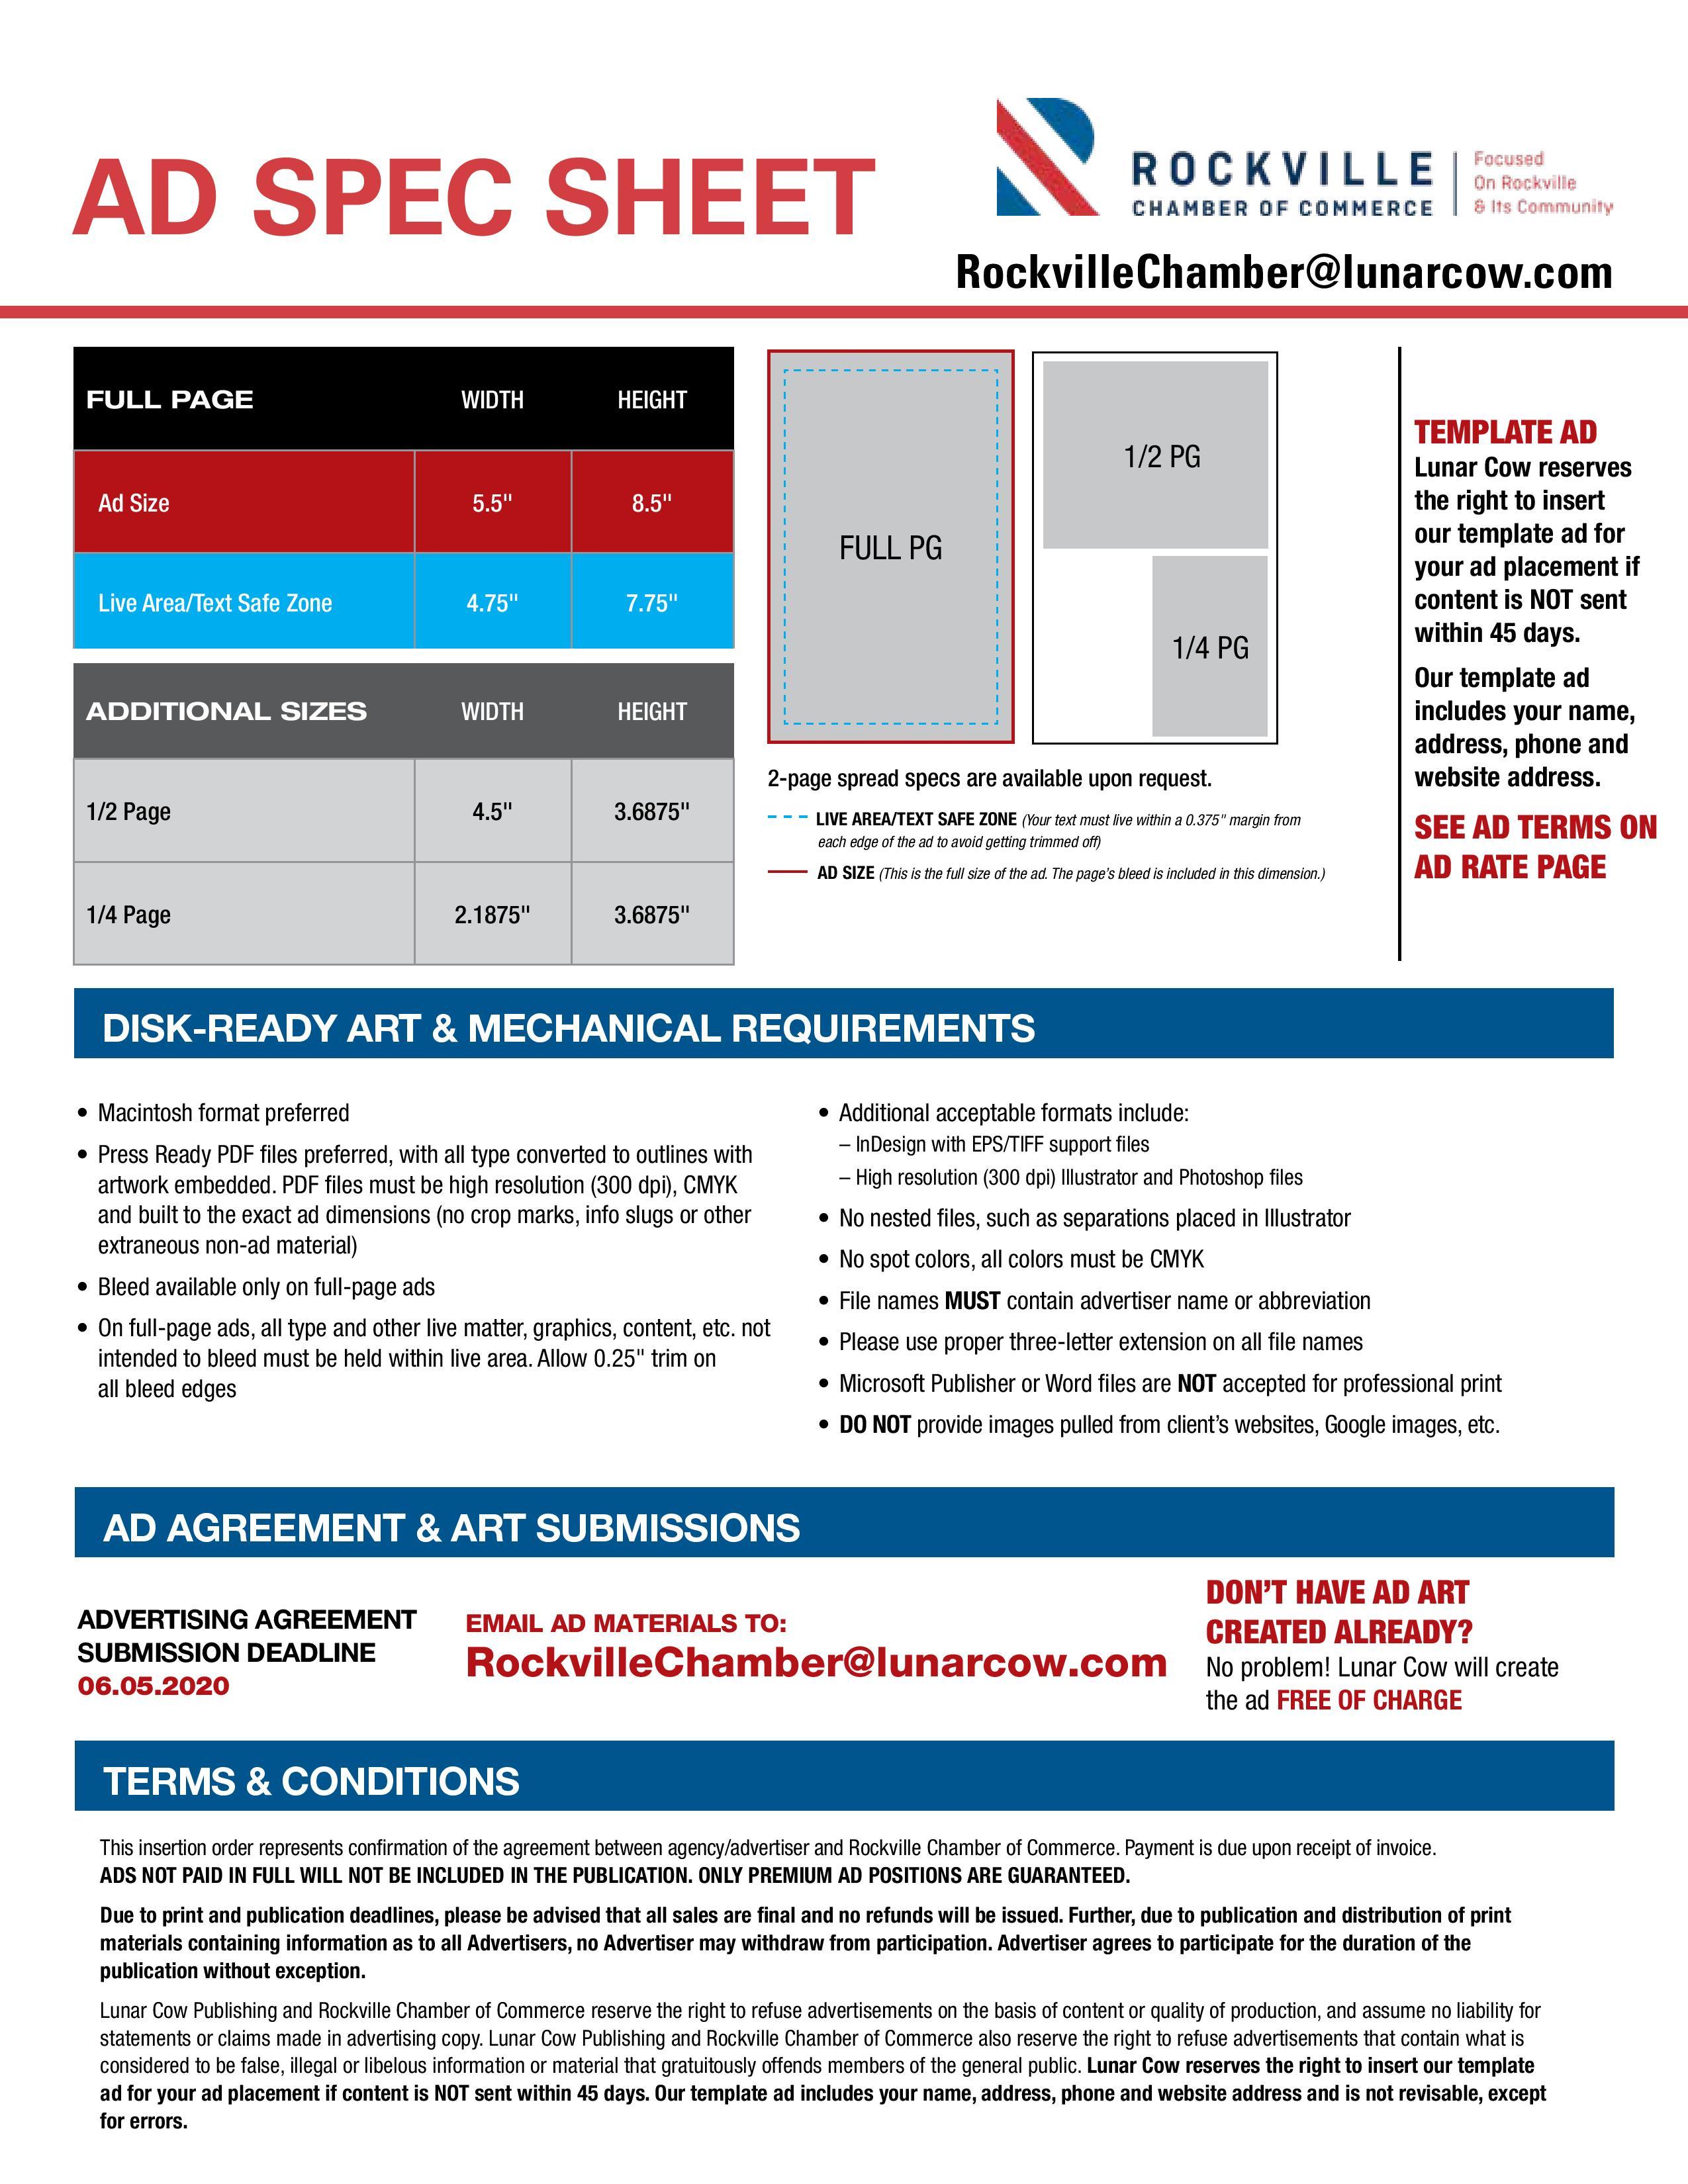 Rockville2020_RateCard-5-LR-page-004.jpg